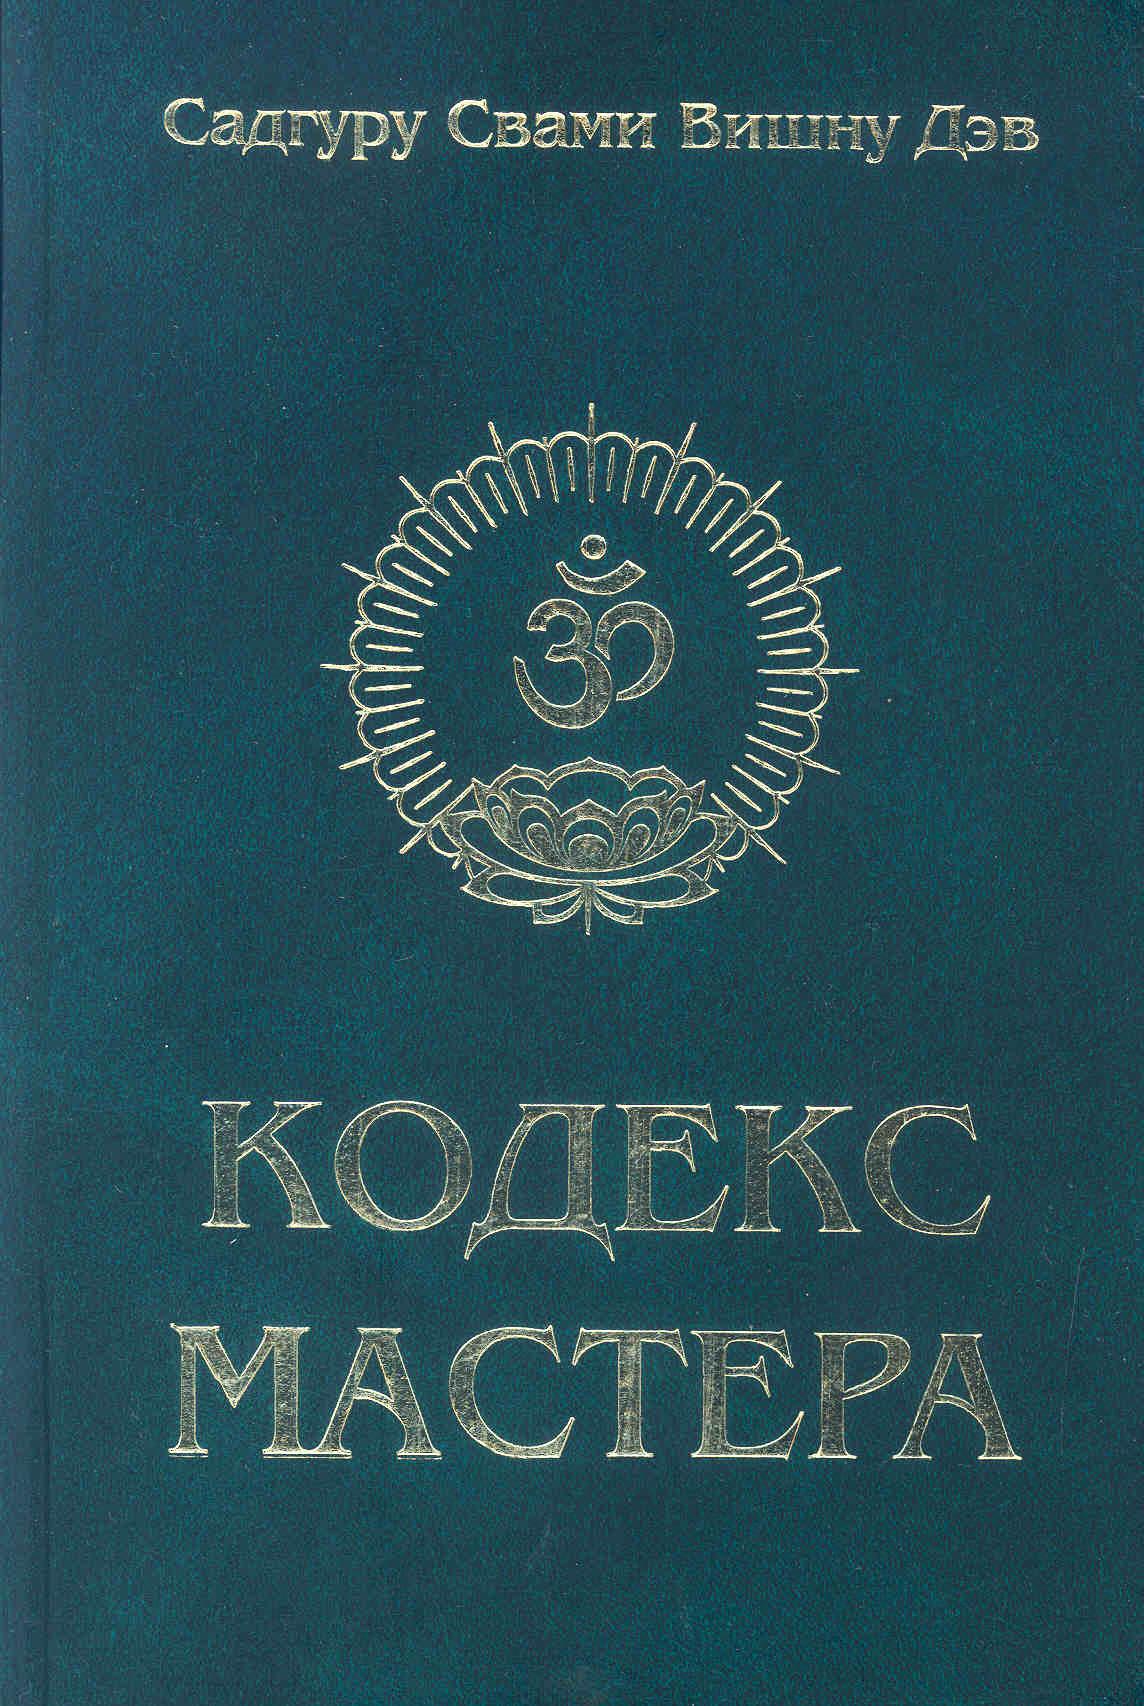 Кодекс Мастера. 2-е изд. (перепл.) Руководство по практике йоги